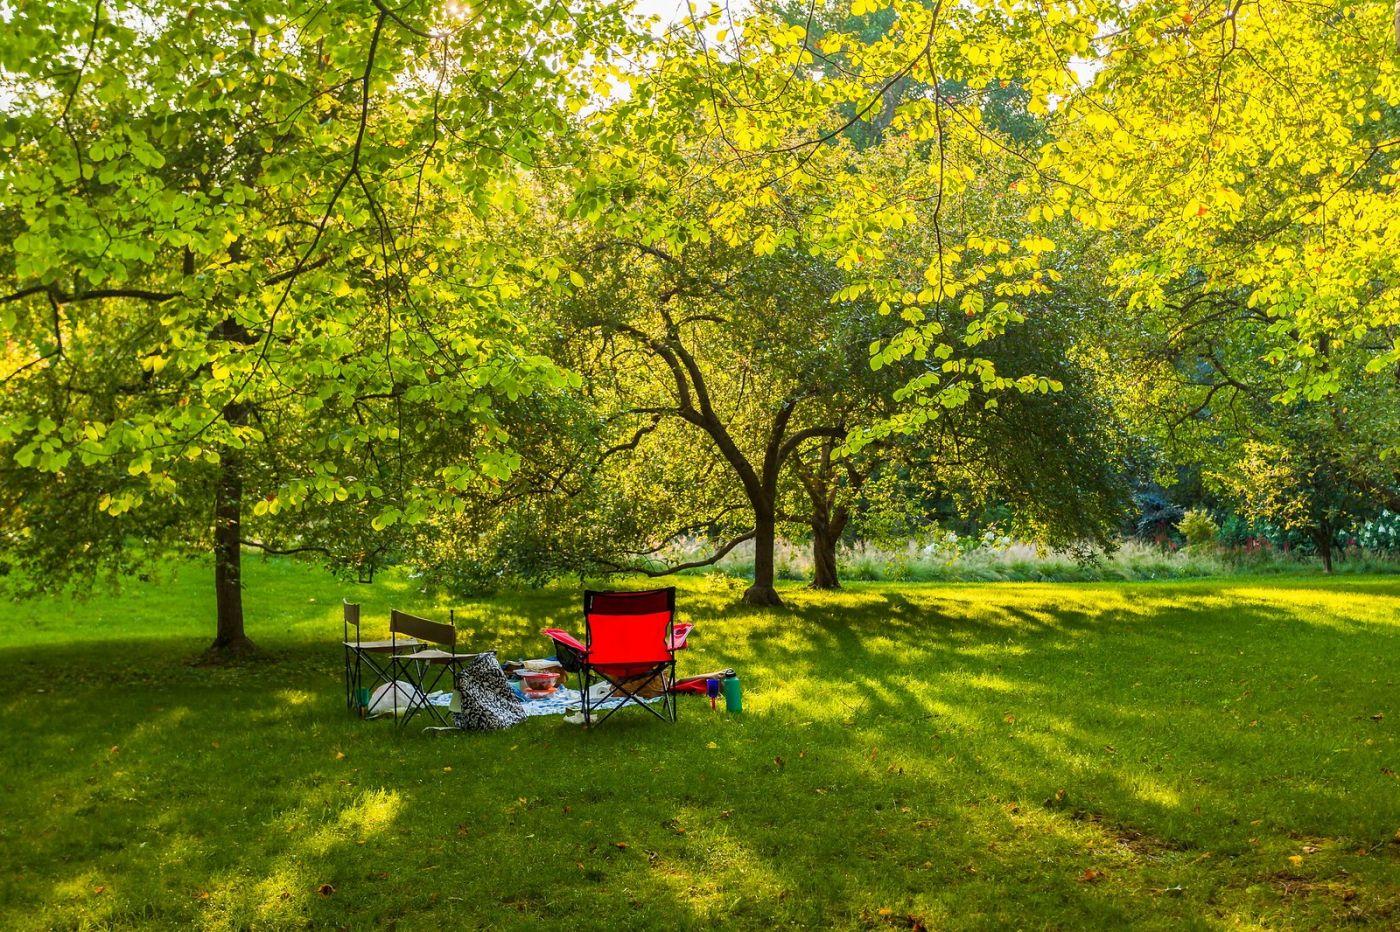 Chanticleer花园,享受大自然_图1-29